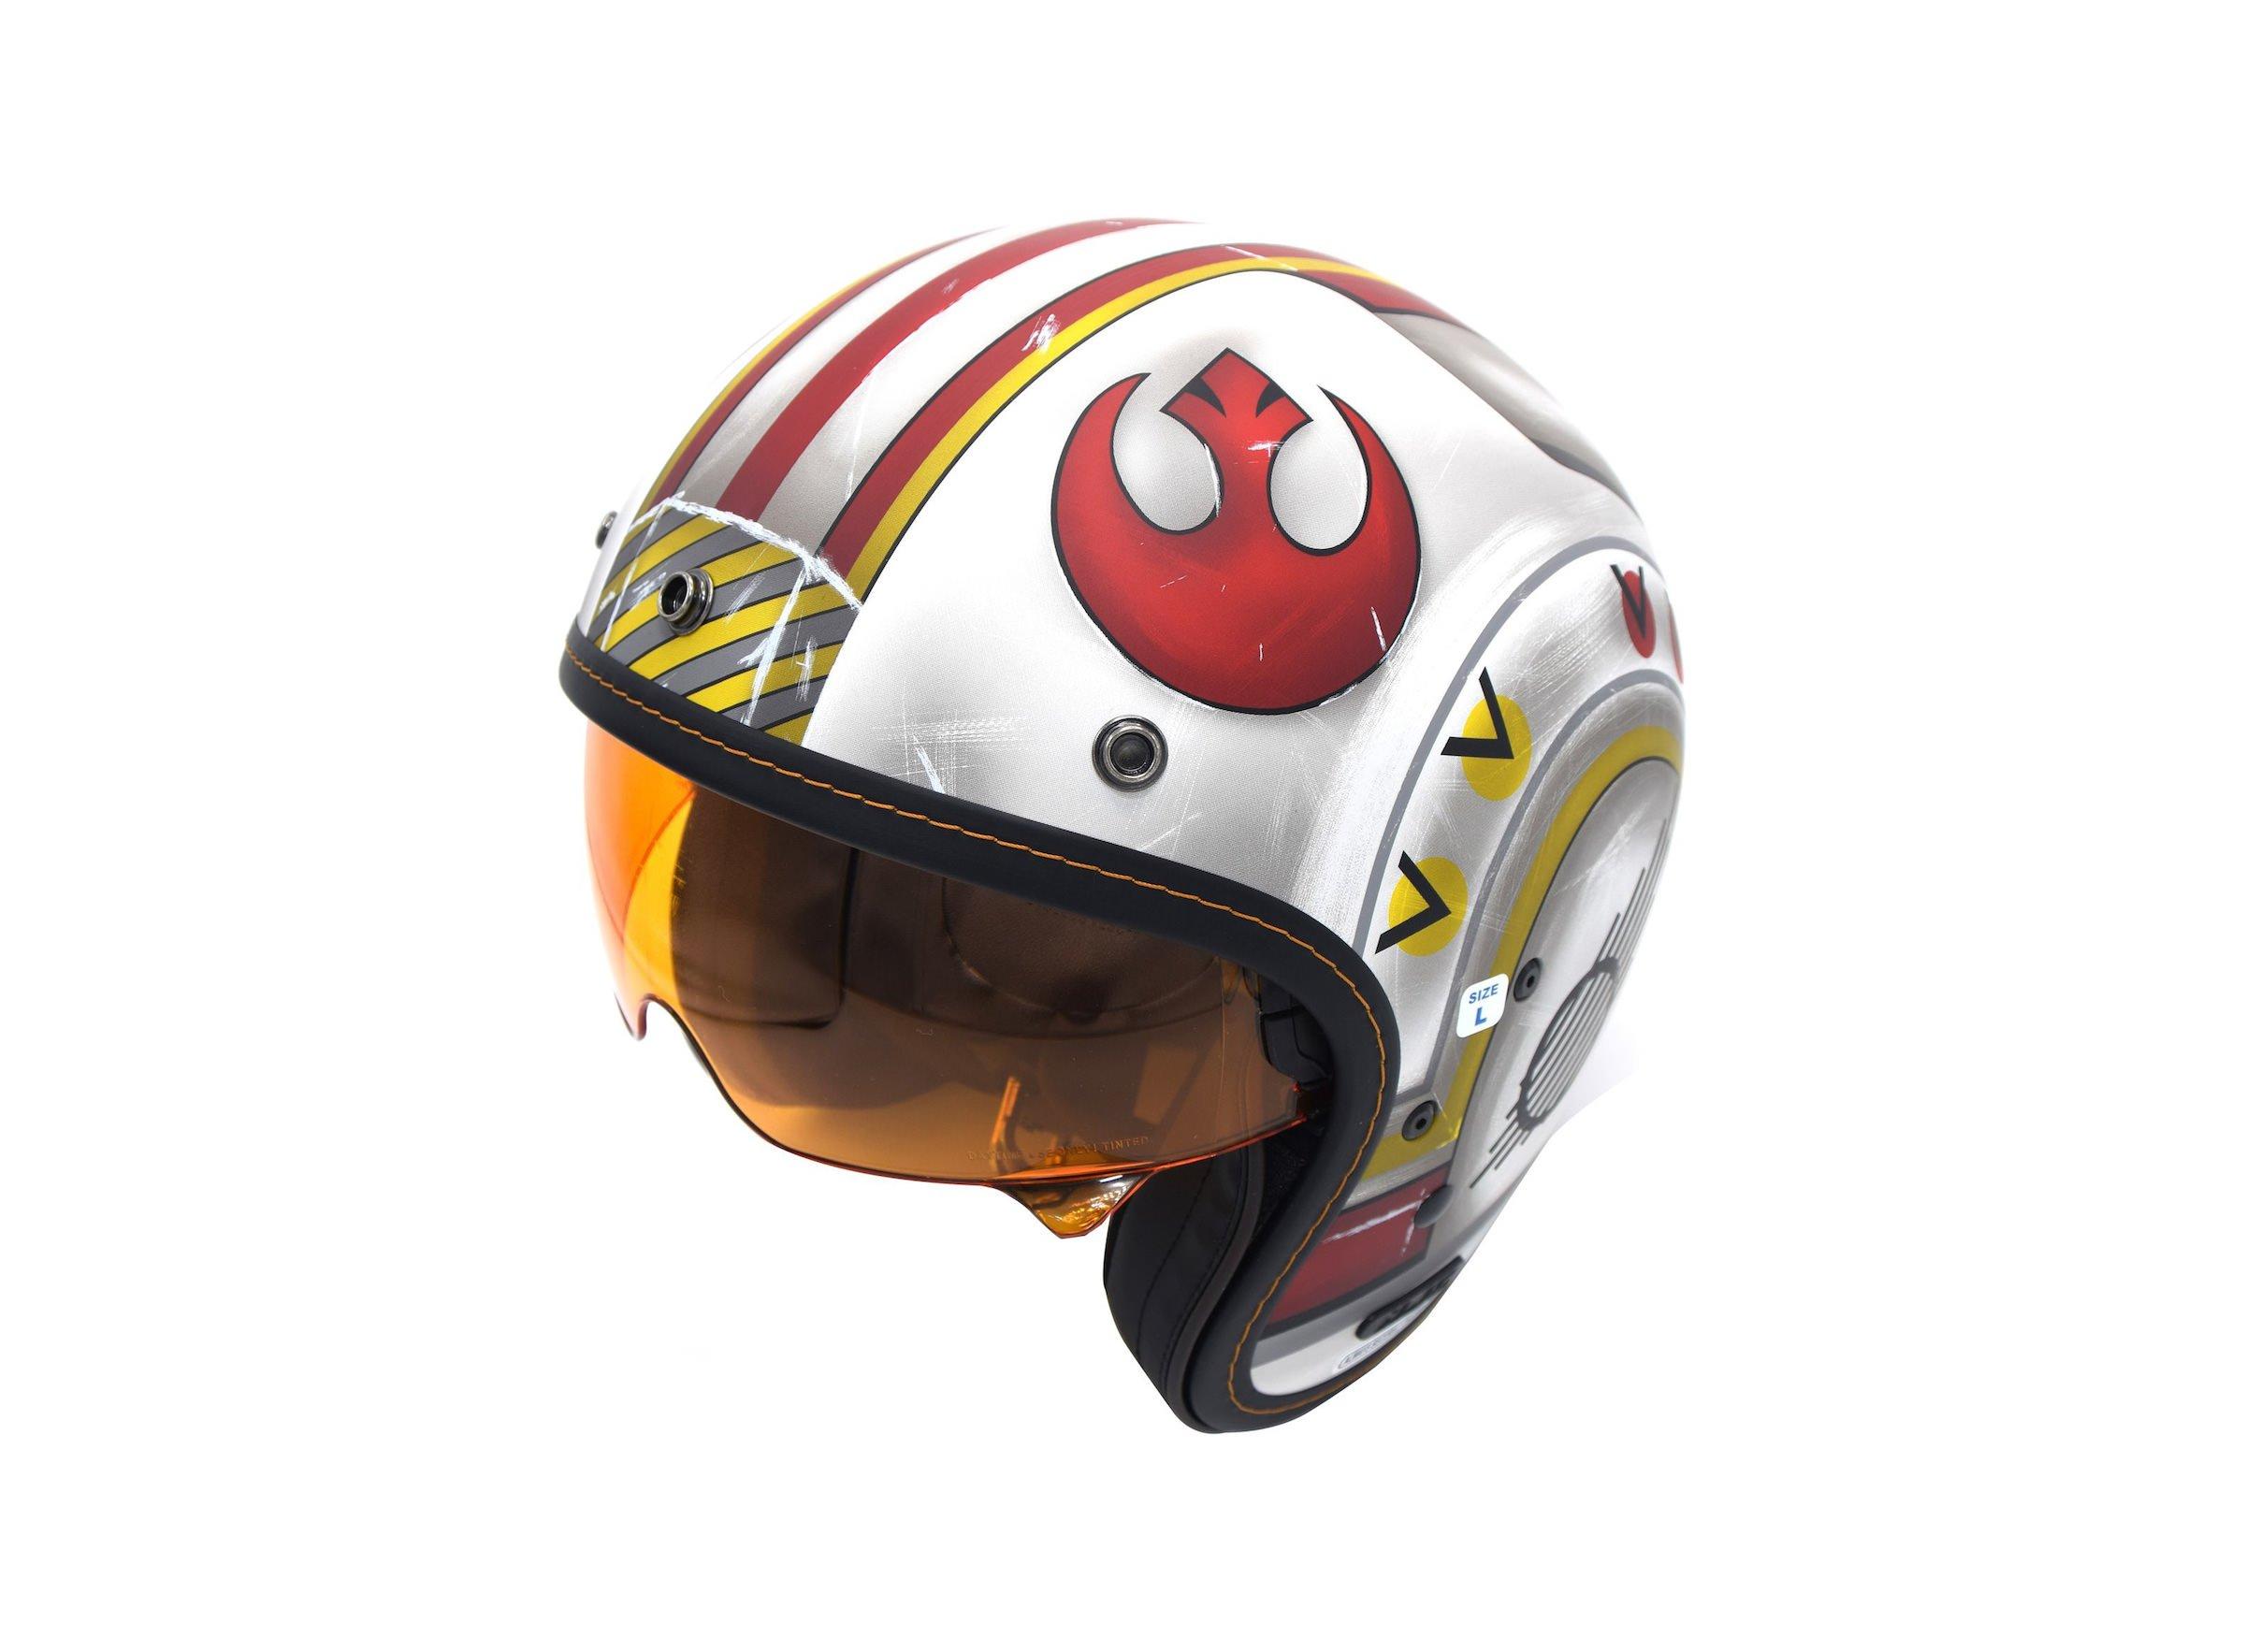 Fighter Pilot Motorcycle Helmet The HJC IS-5 X-...